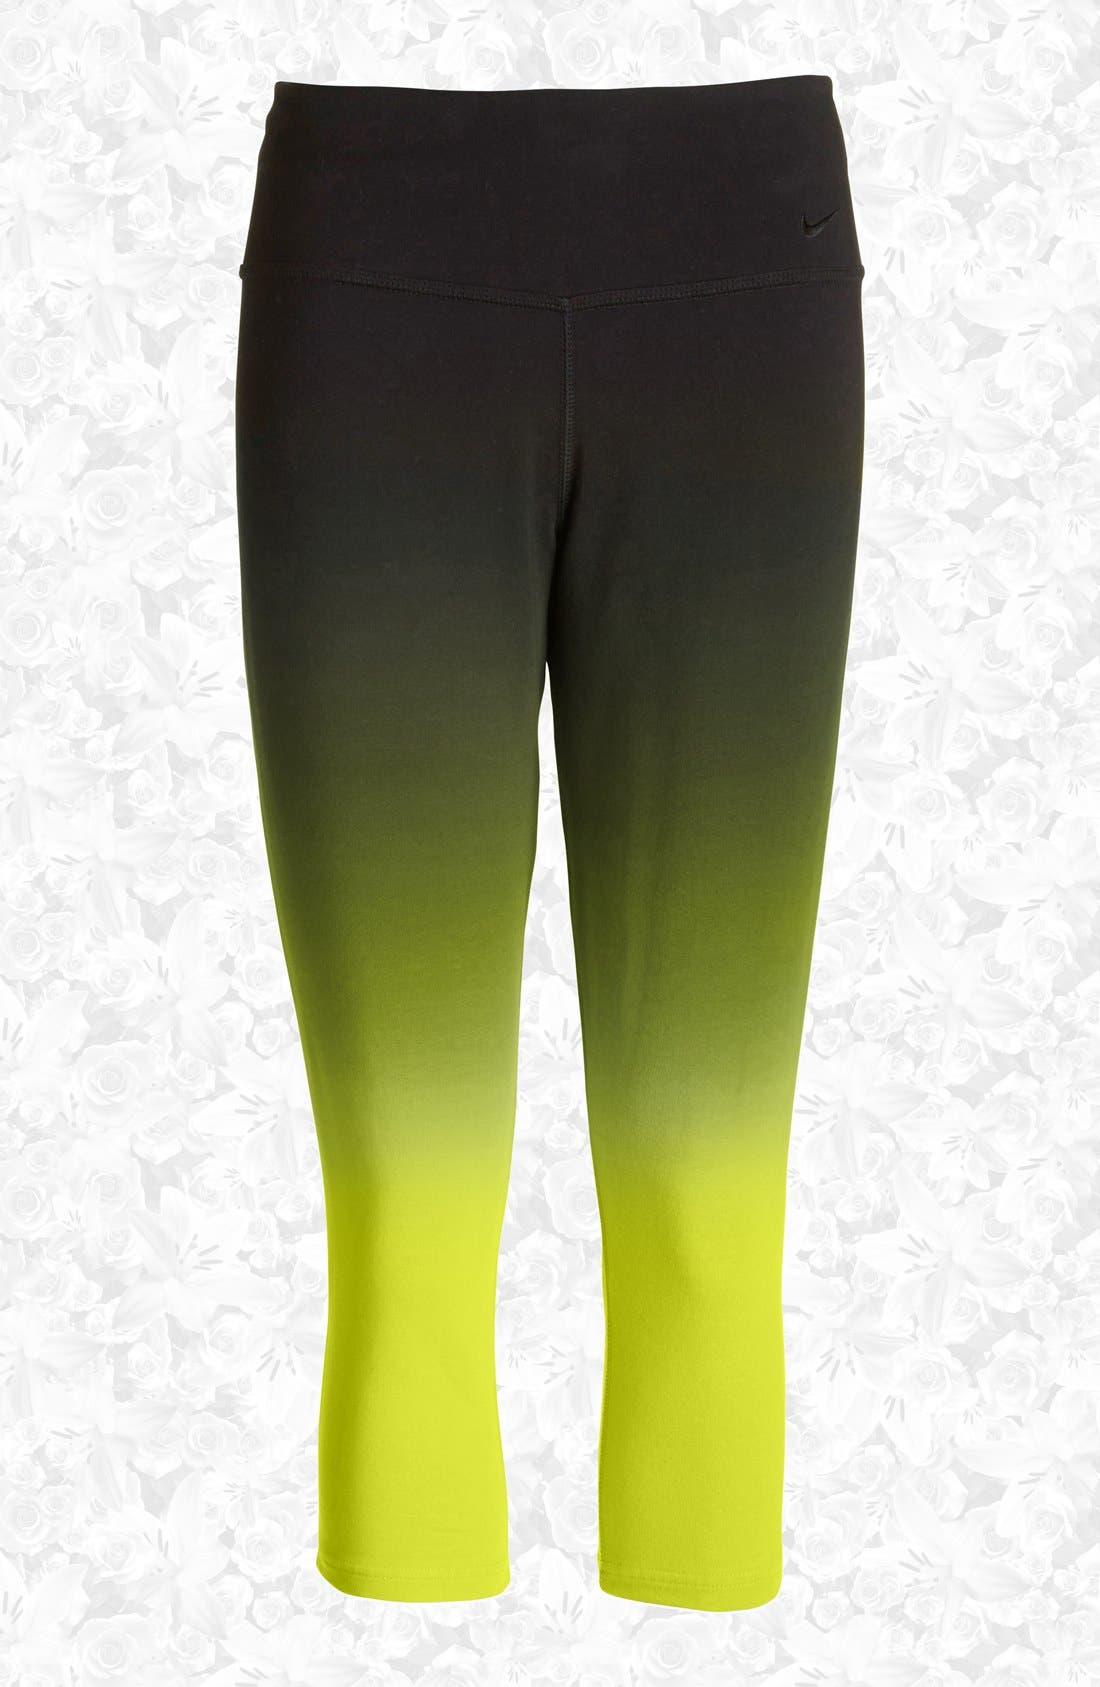 Alternate Image 1 Selected - Nike 'Legend 2.0 Sunset Tight' Dri-FIT Training Capri Leggings (Women)